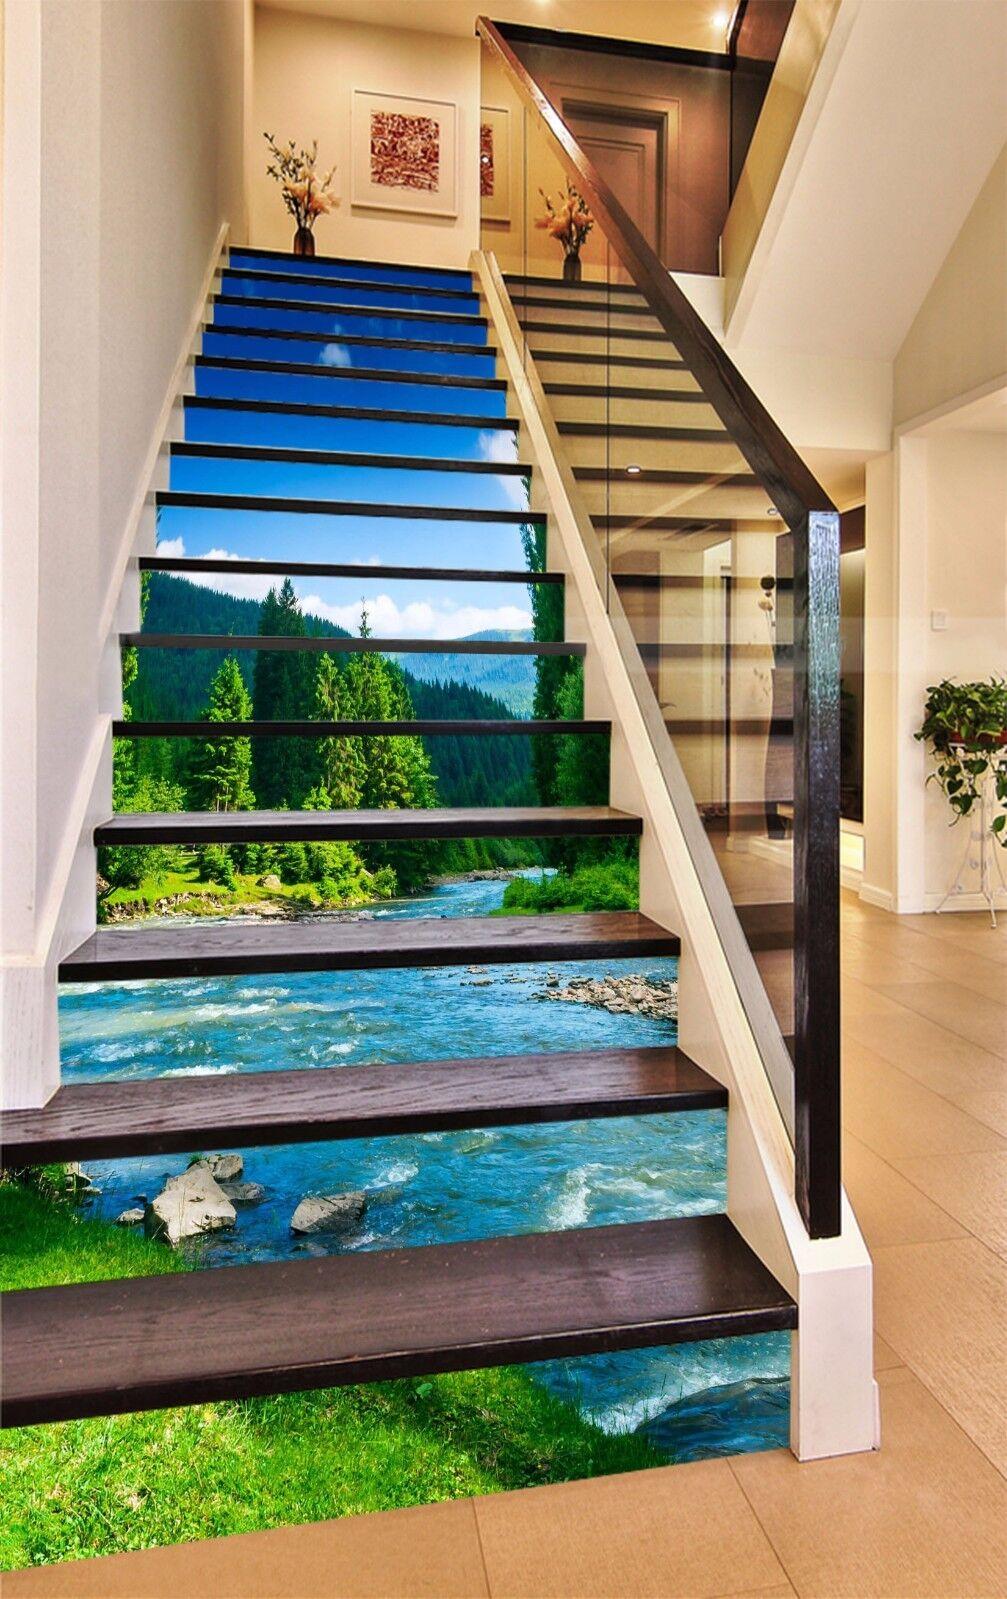 3D vert Forest 727 Stair Risers Decoration Photo Mural Vinyl Decal Wallpaper AU